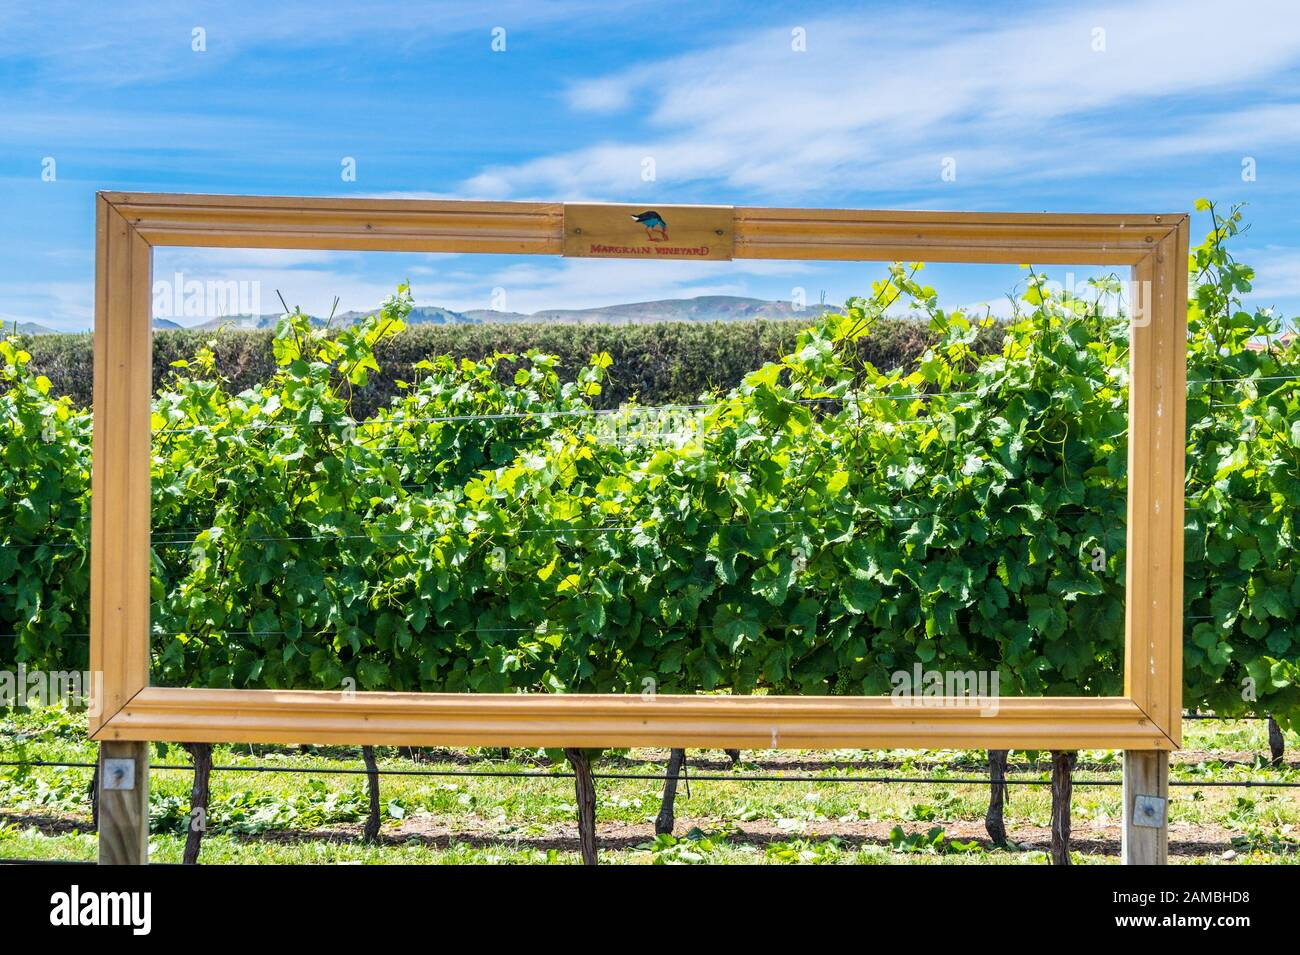 giant-picture-frame-with-a-view-of-admiral-hill-margrain-vineyard-martinborough-wairarapa-new-zealand-2AMBHD8.jpg